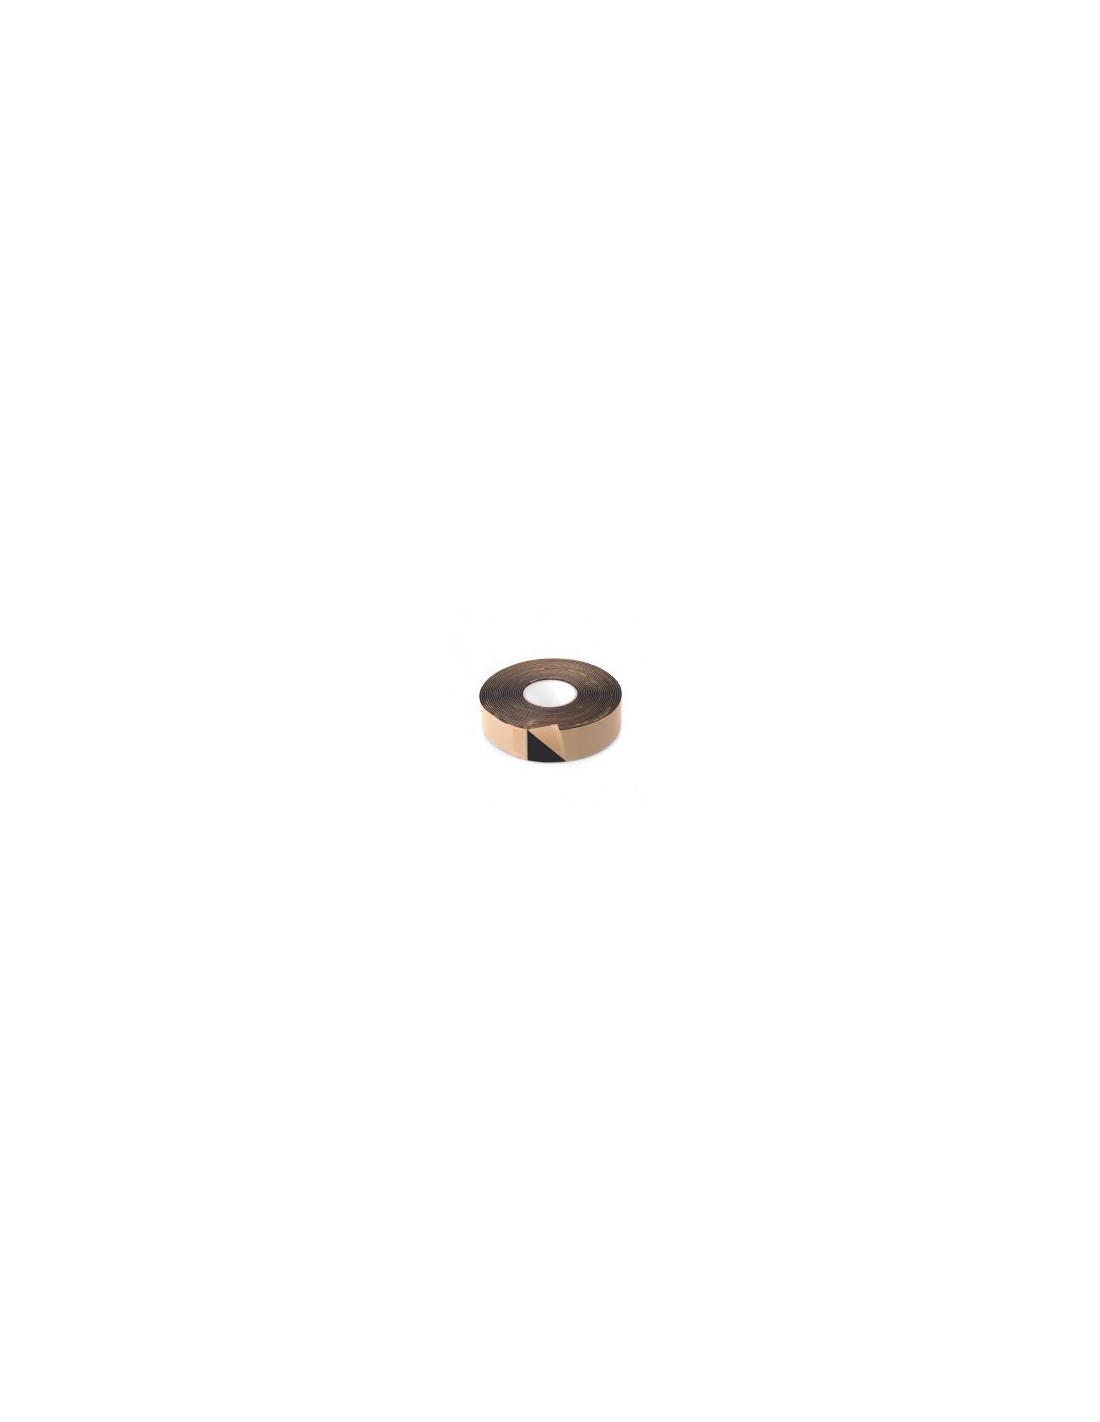 IZO00015 - Isoleringstejp 3x50mm